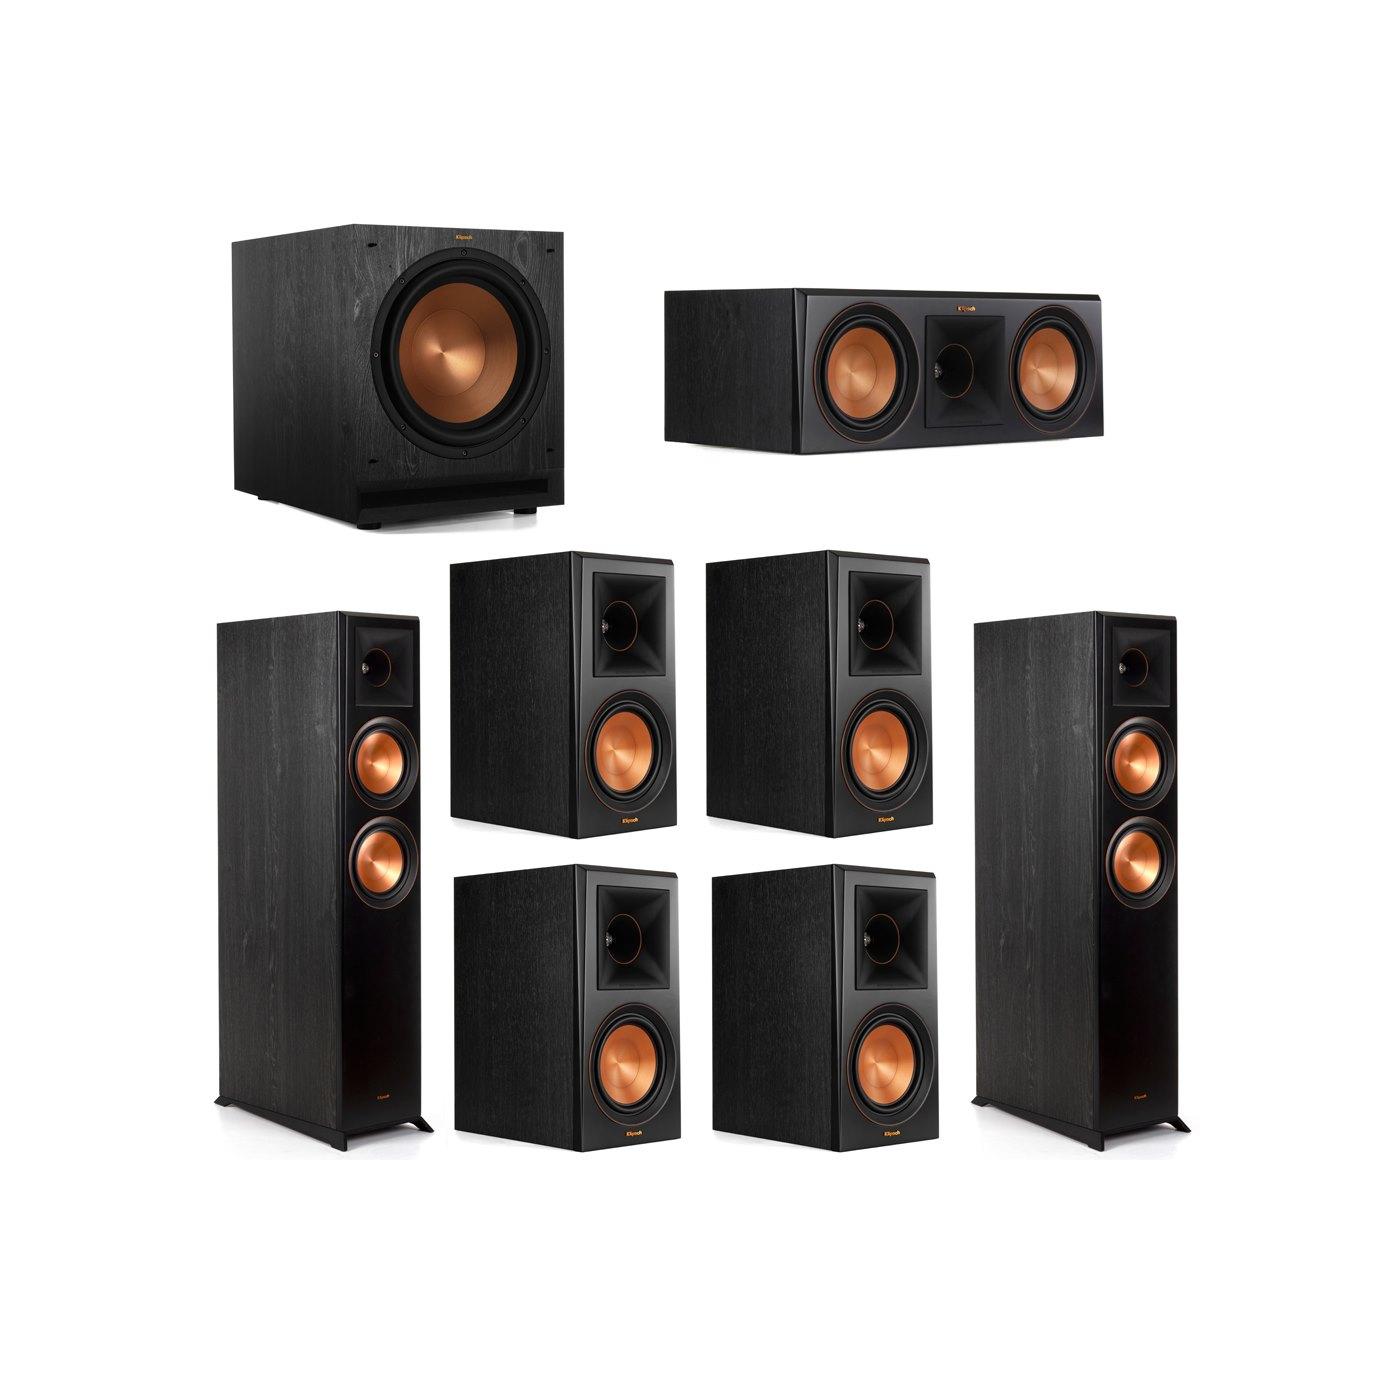 Klipsch 7.1 System with 2 RP-6000F Floorstanding Speakers, 1 Klipsch RP-600C Center Speaker, 4 Klipsch RP-600M Surround Speakers, 1 Klipsch SPL-120 Subwoofer